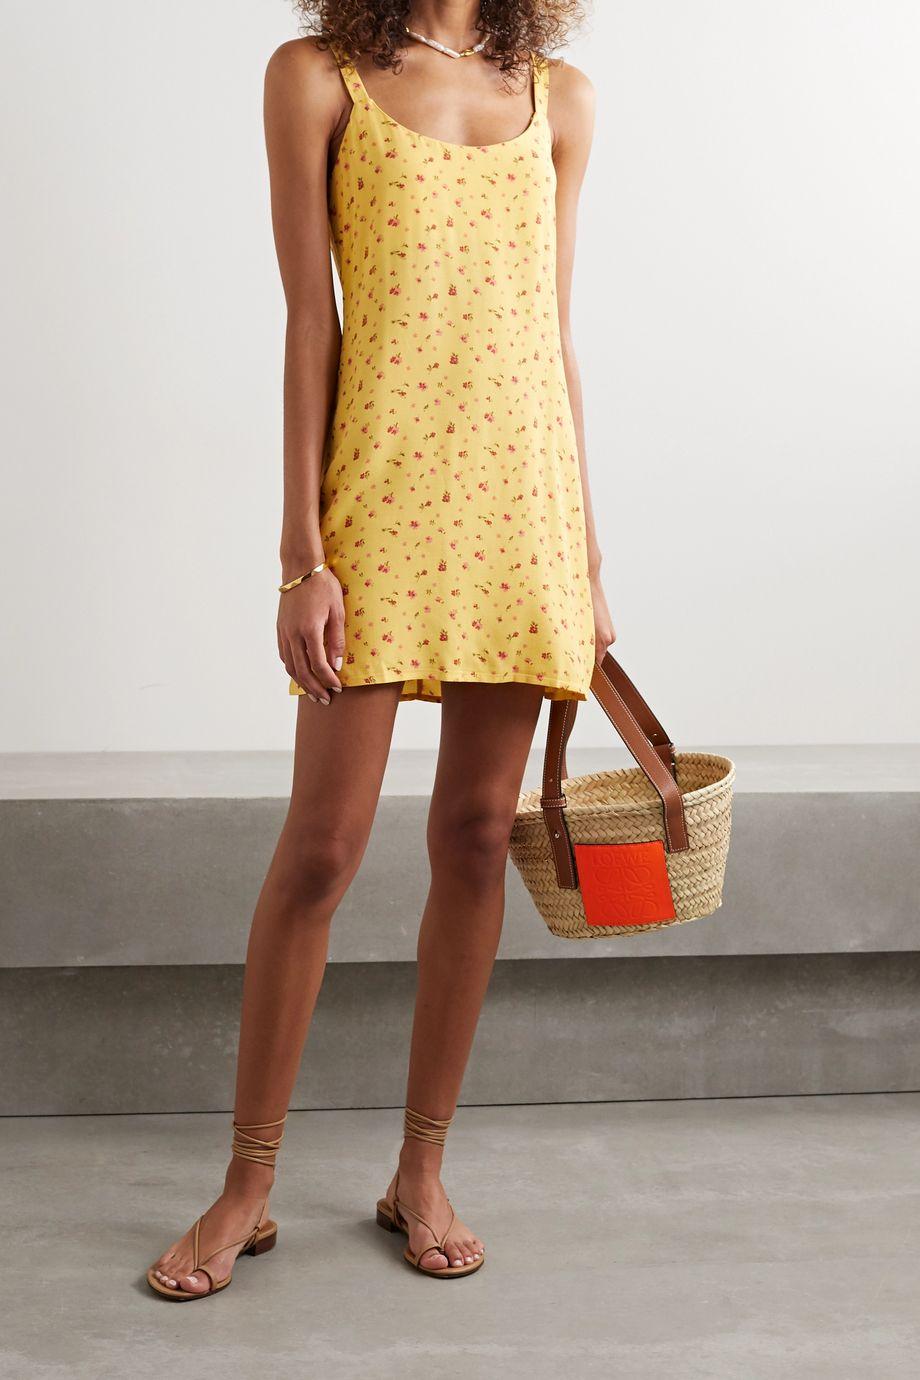 Reformation Puglia floral-print crepe mini dress